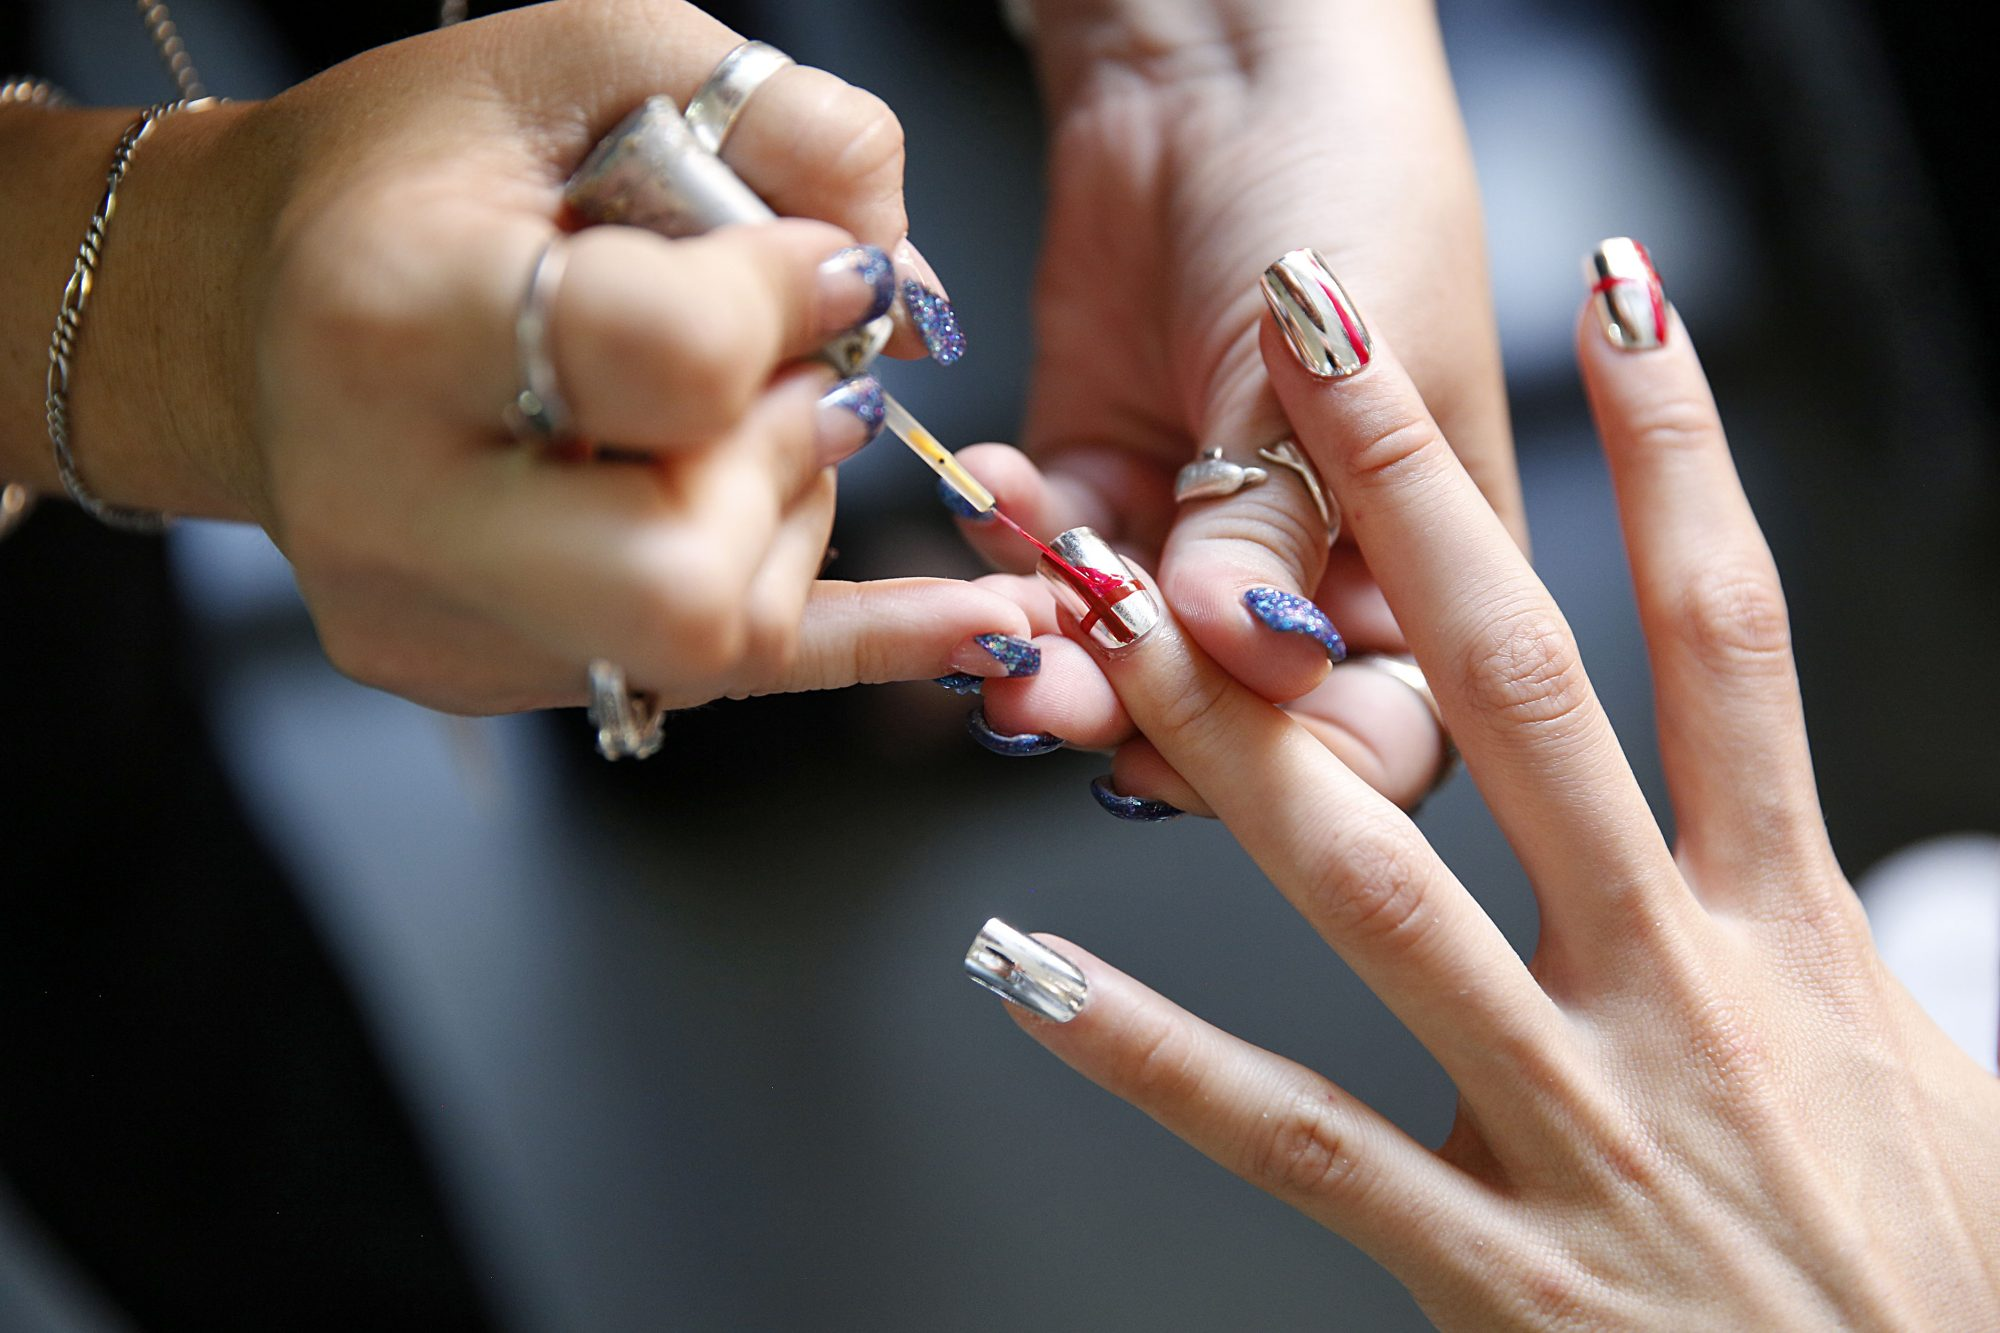 picture-of-nyfw-nails-metallic-photo.jpg